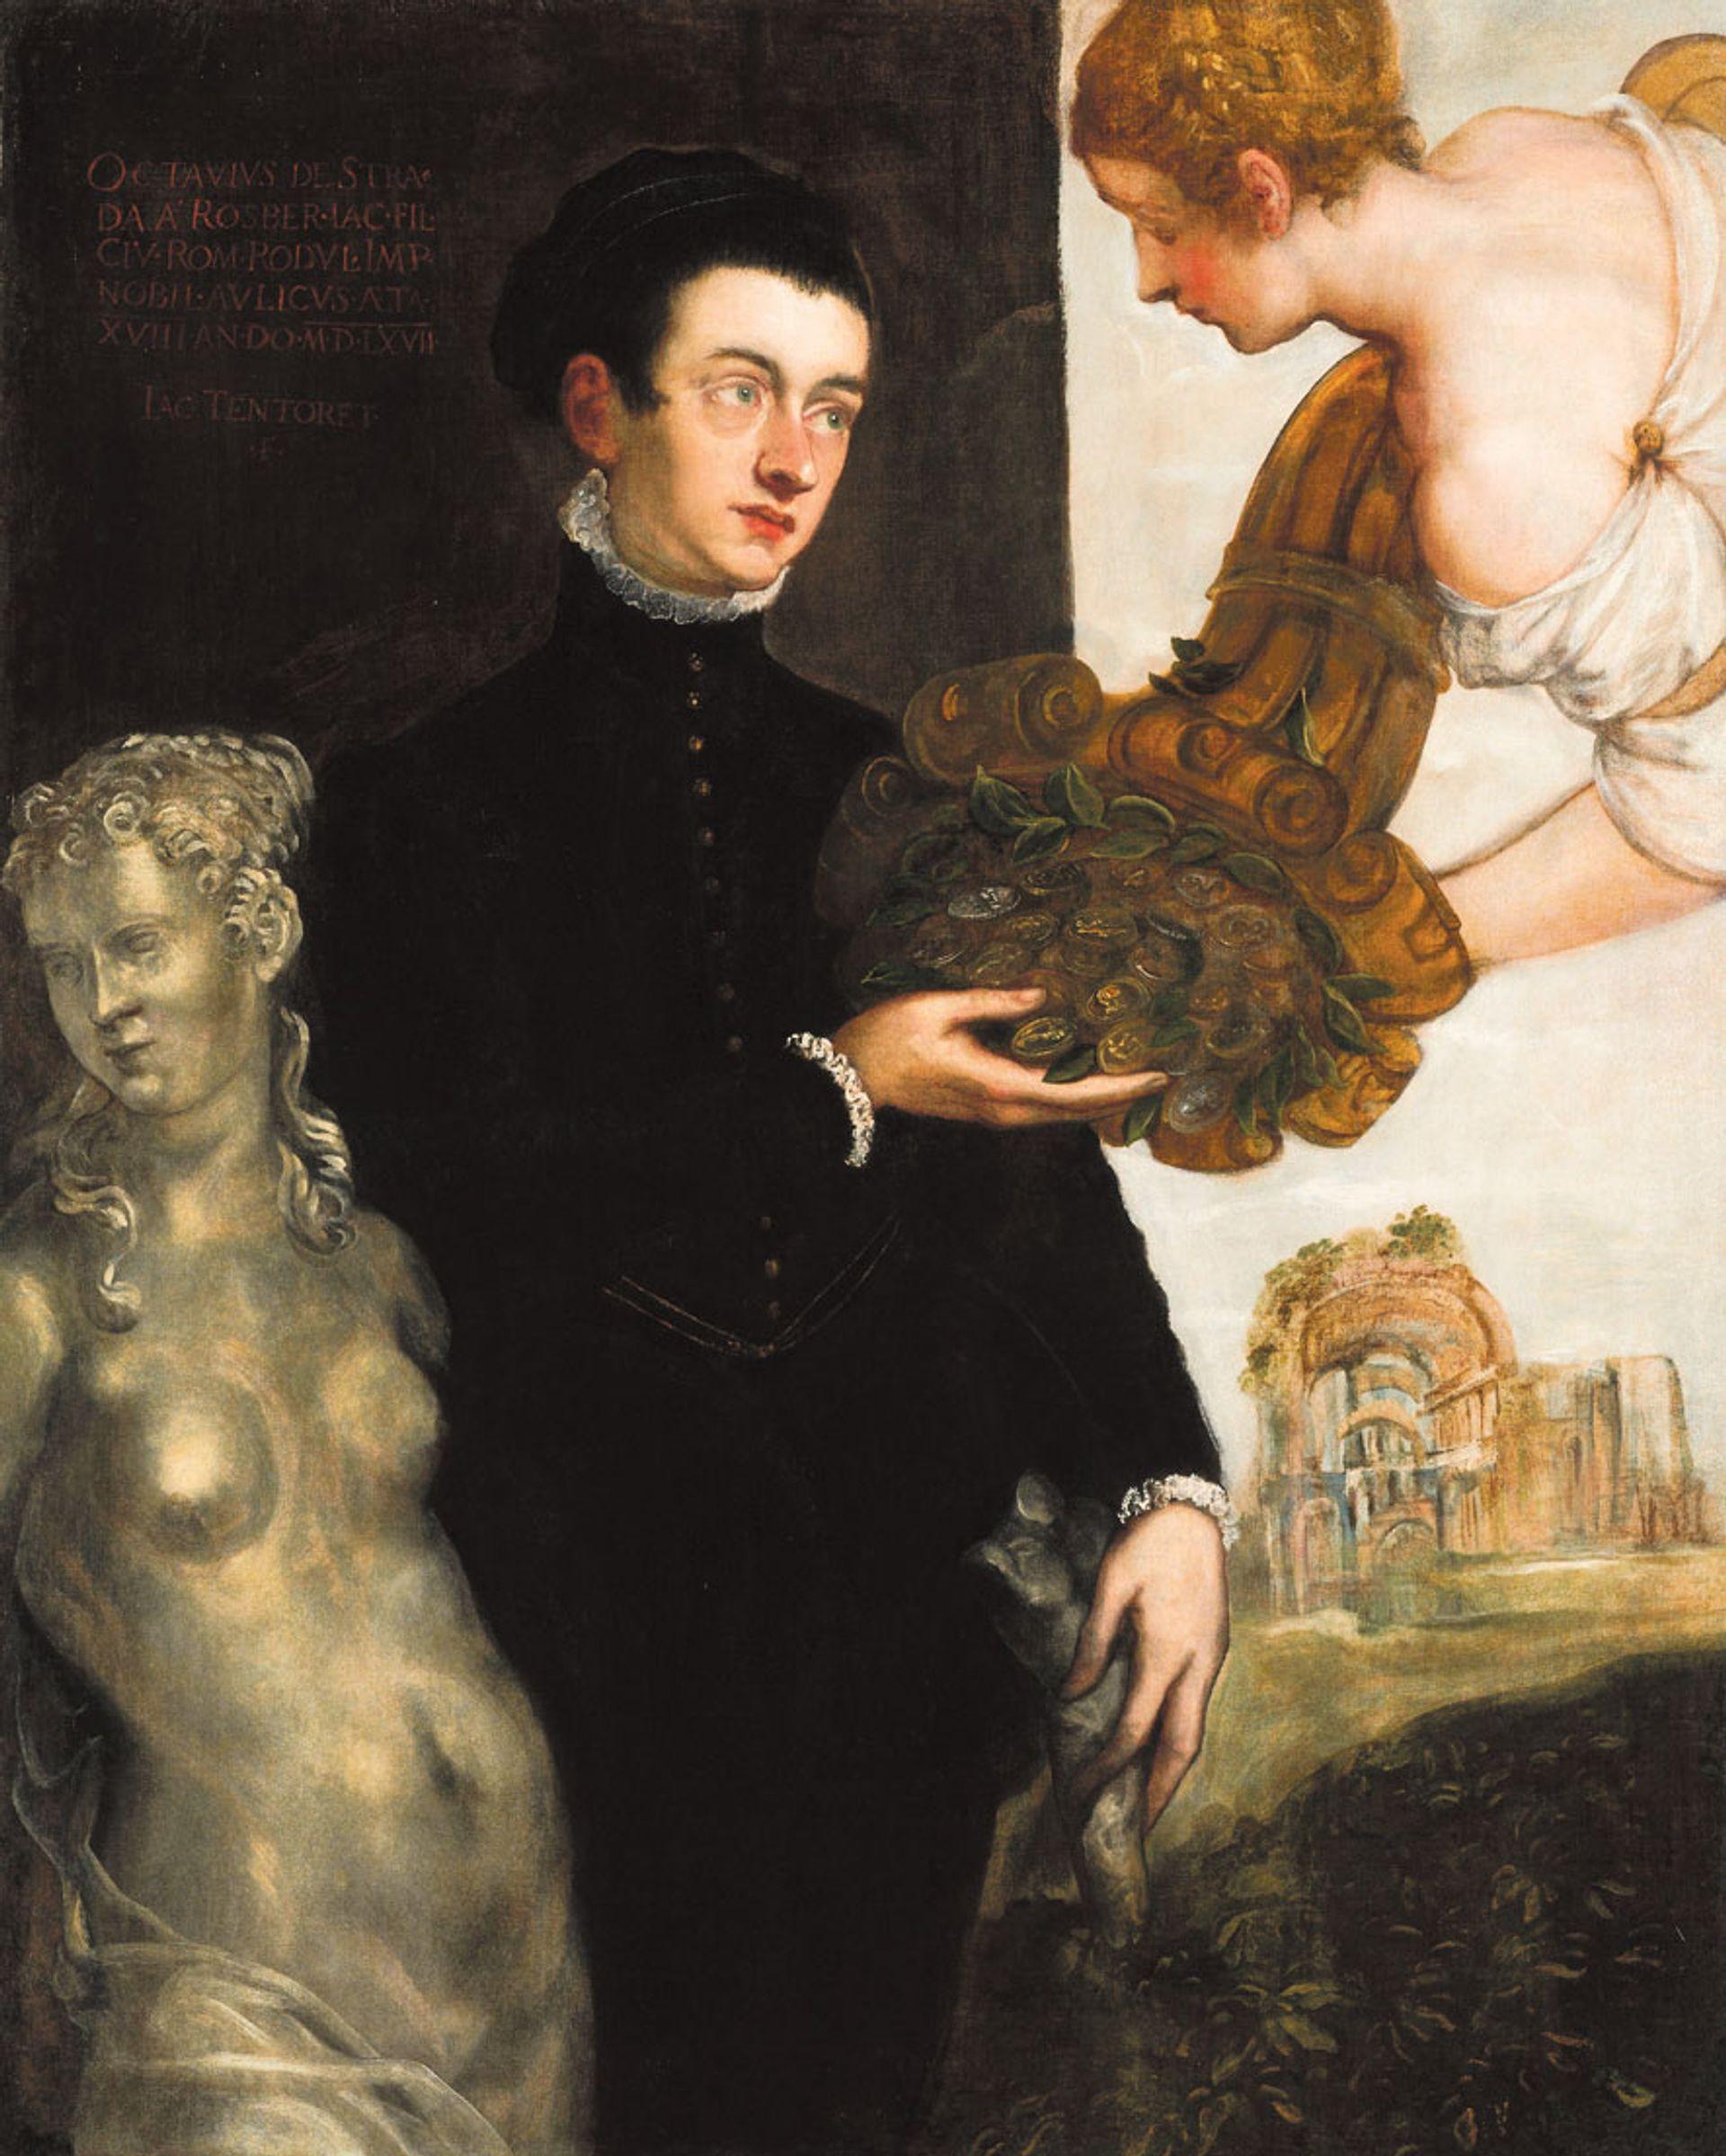 Jacopo Tintoretto's Portrait of Ottavio Strada (1567) features in Mary Beard's Twelve Caesars Rijksmuseum, Amsterdam